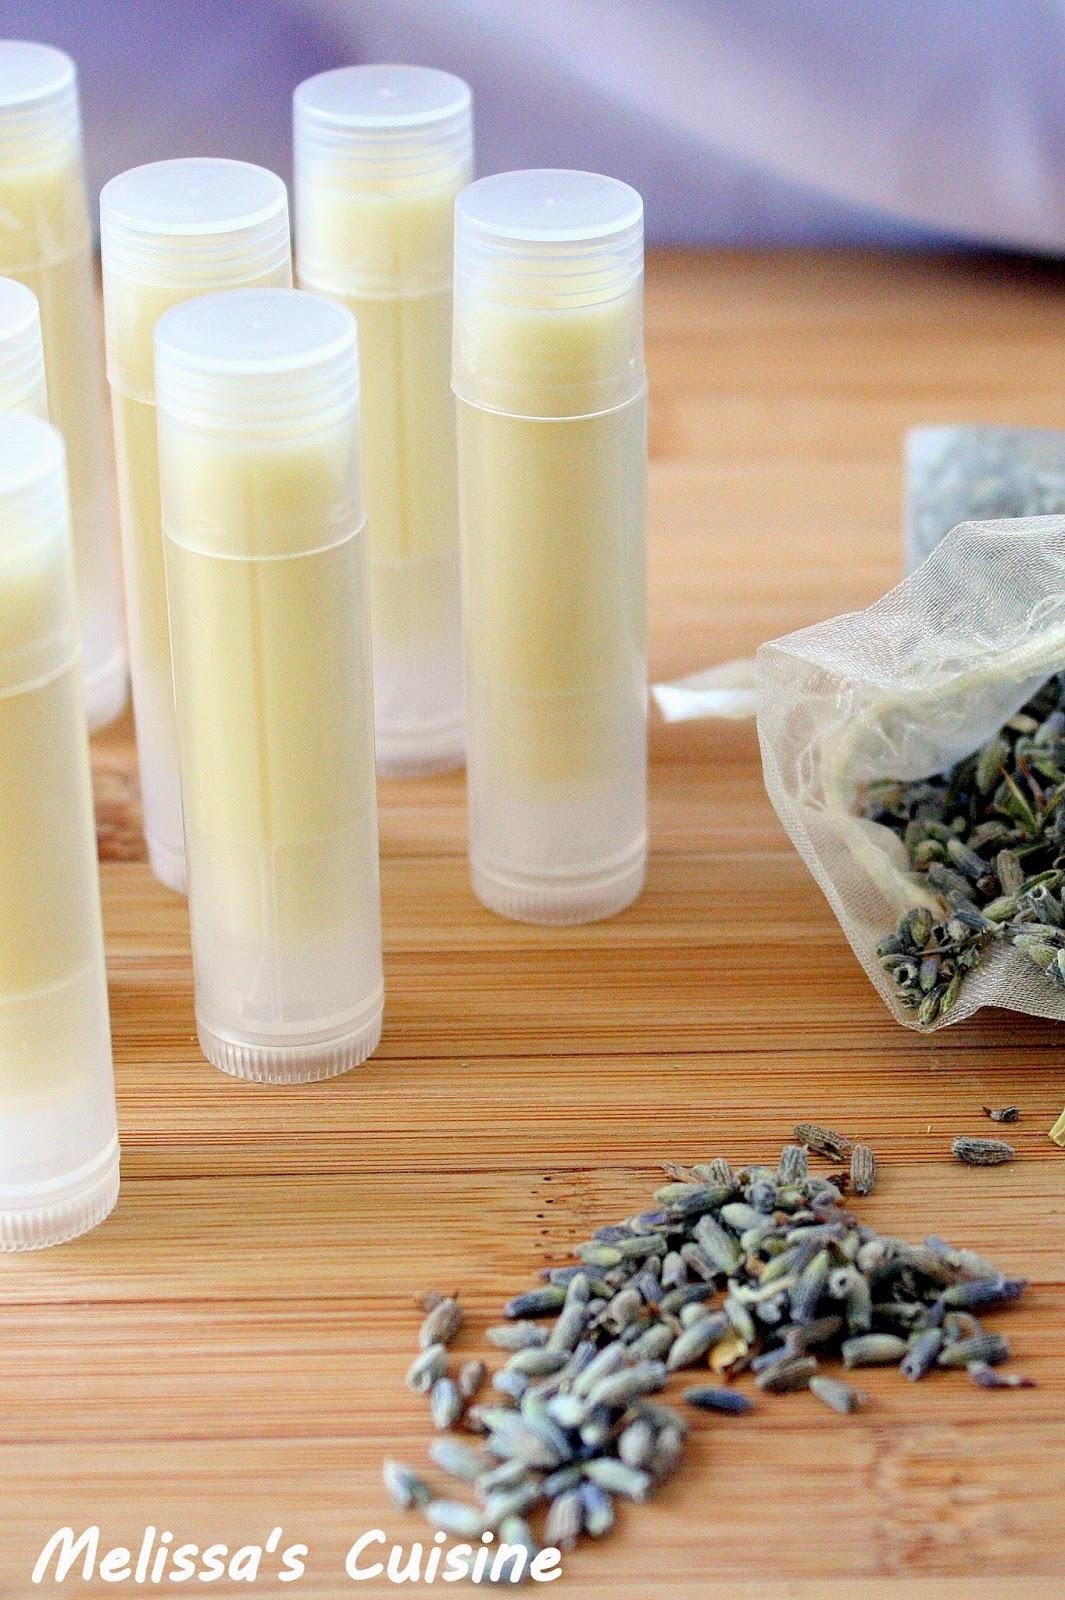 Melissa's Cuisine: Lavender Lip Balm